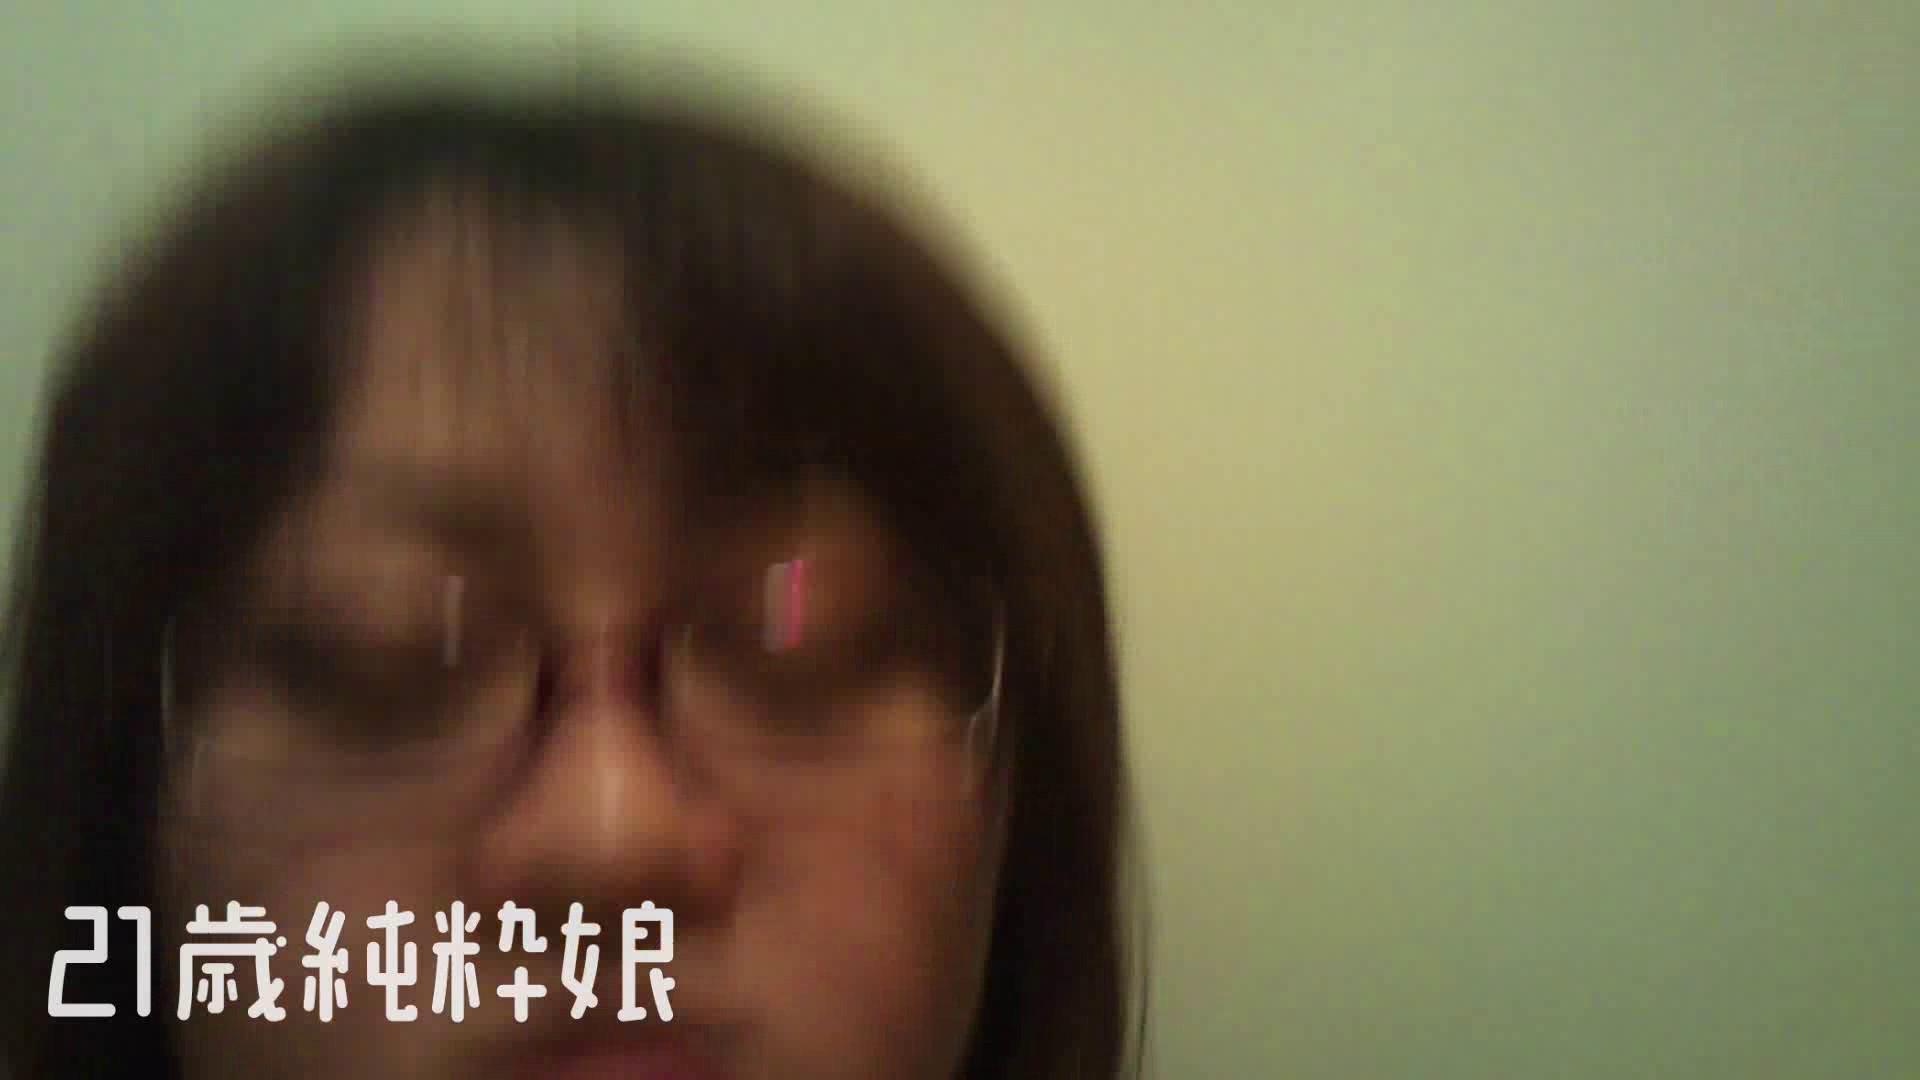 Gカップ21歳純粋嬢第2弾Vol.5 OLヌード天国  110PIX 22